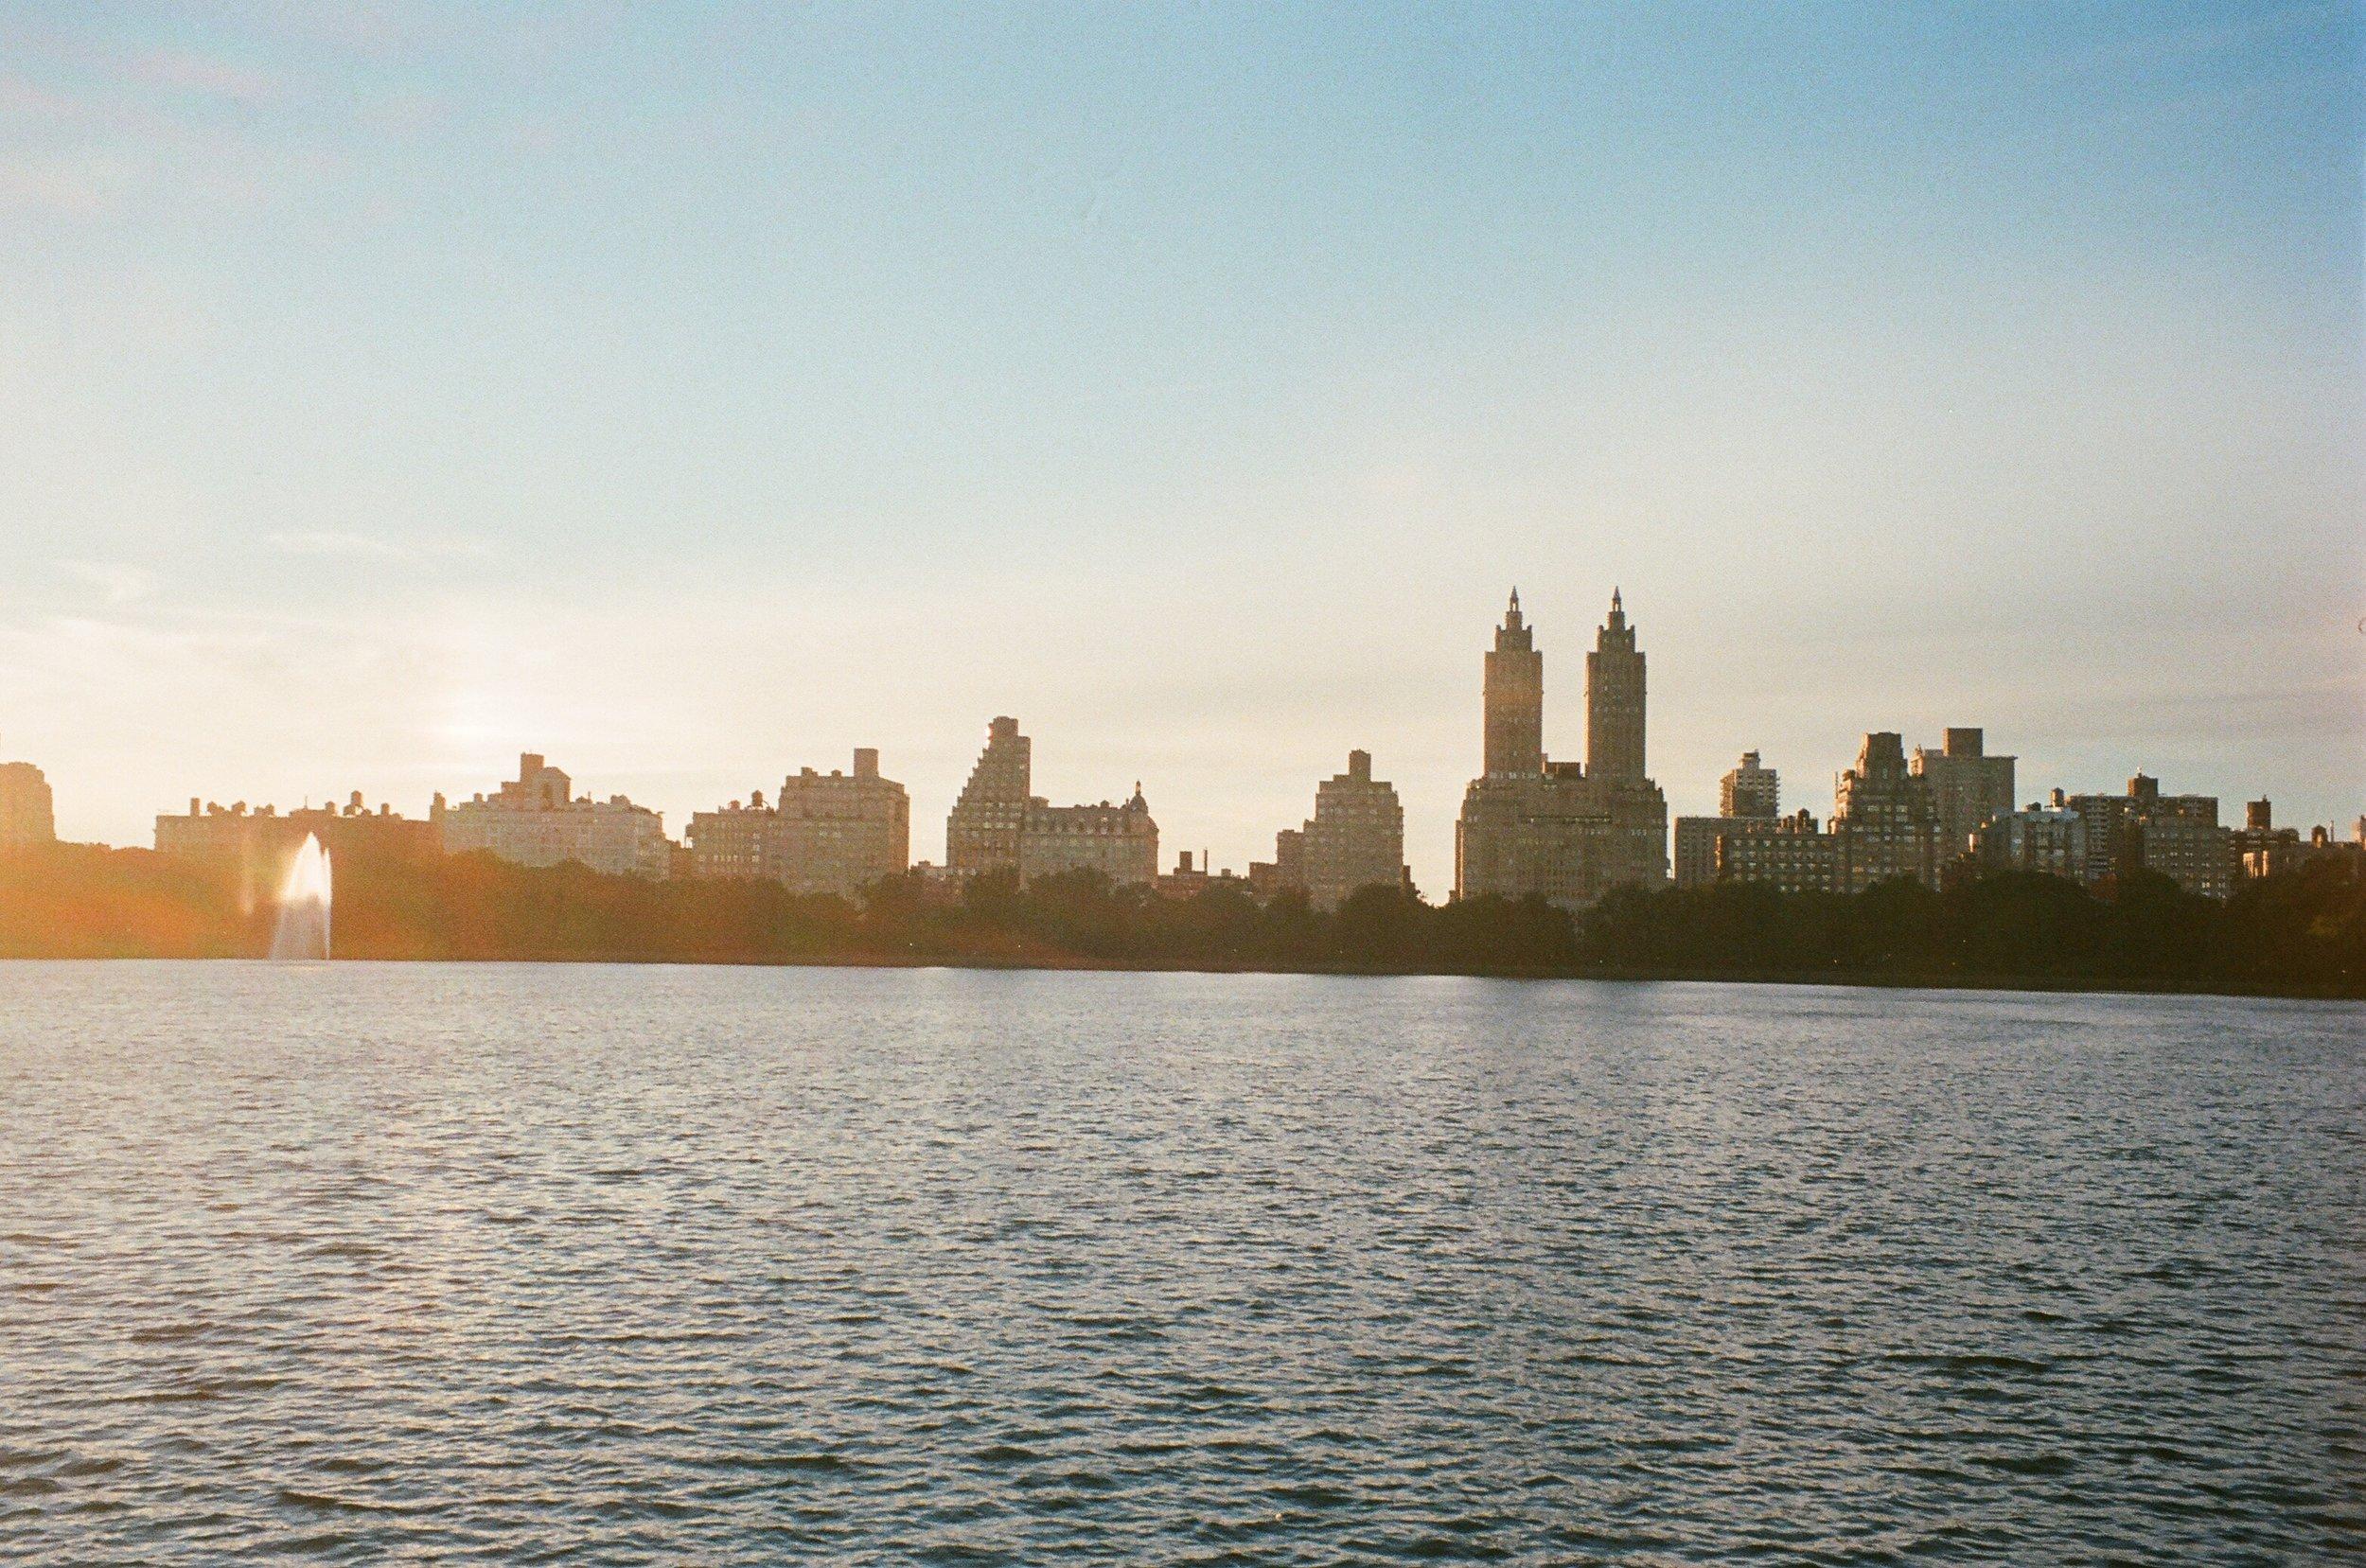 Jacqueline Kennedy Onassis Reservoir at Central Park